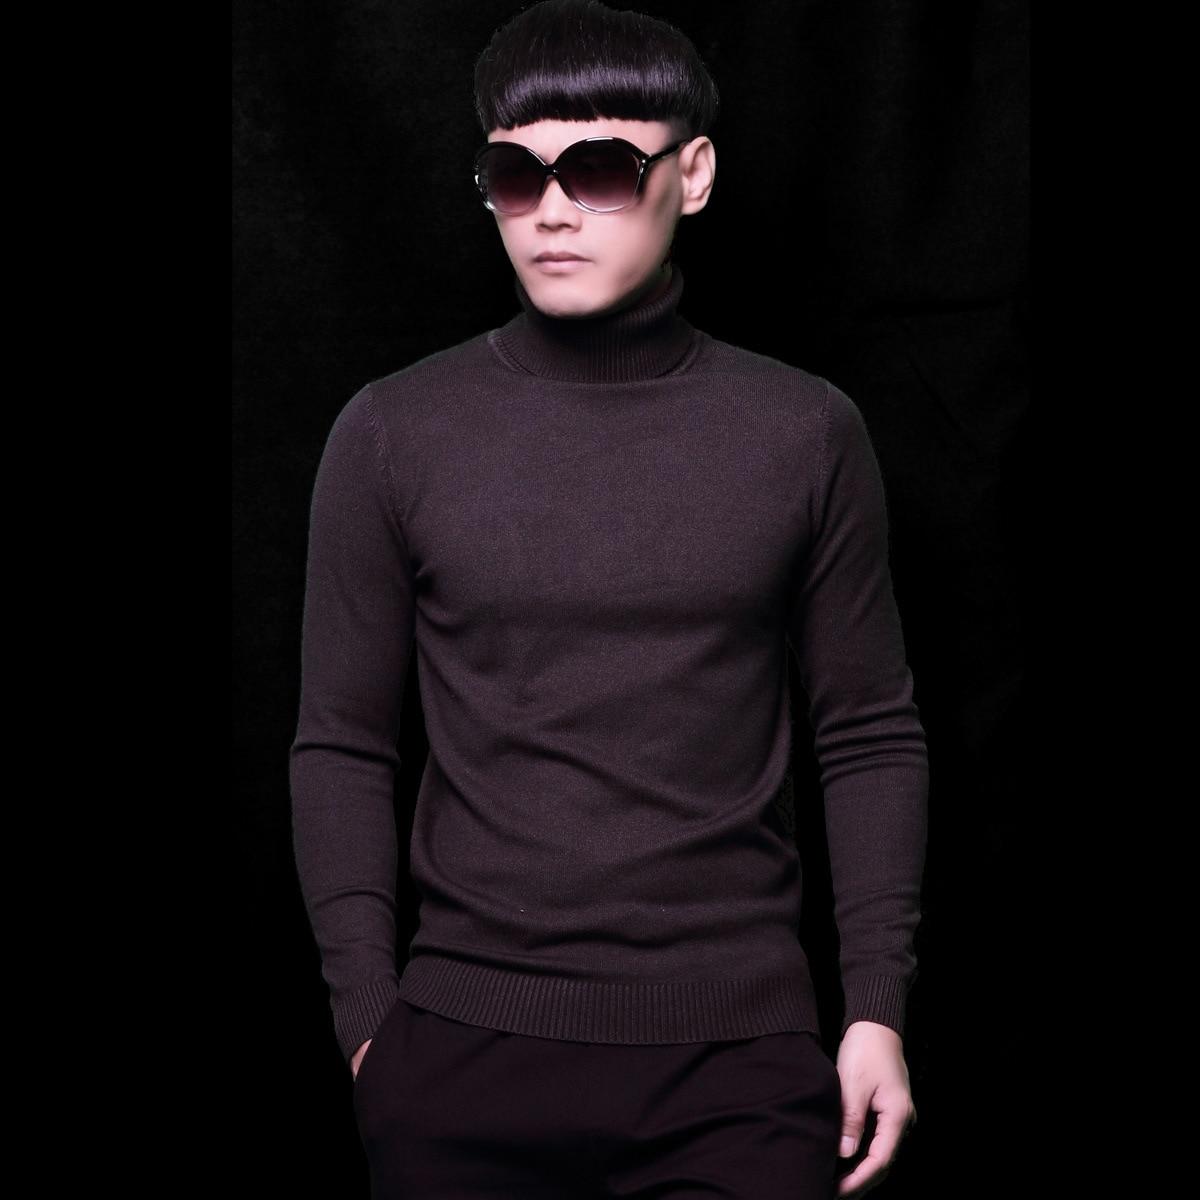 Boys Purple Sweaters Mens Winter Long Sleeve Sweater Slim Pullovers Plus Size Male Knitwear Minimalist Casual Knitted Turtleneck